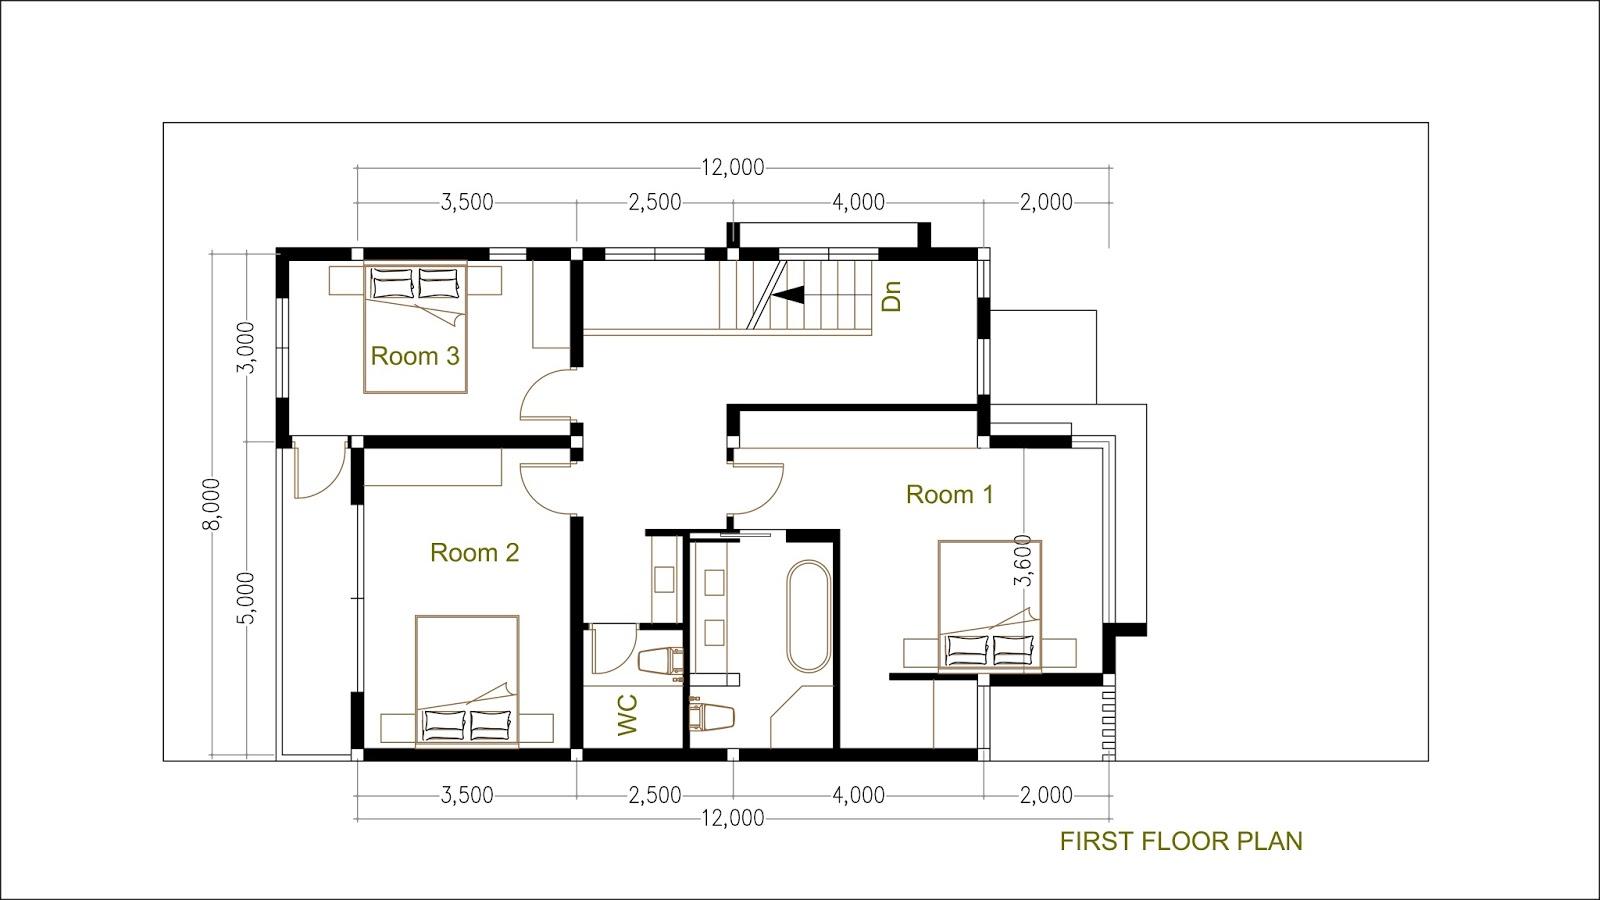 Sketchup modern home plan size 8x12m sam architect for Modern house design sketchup